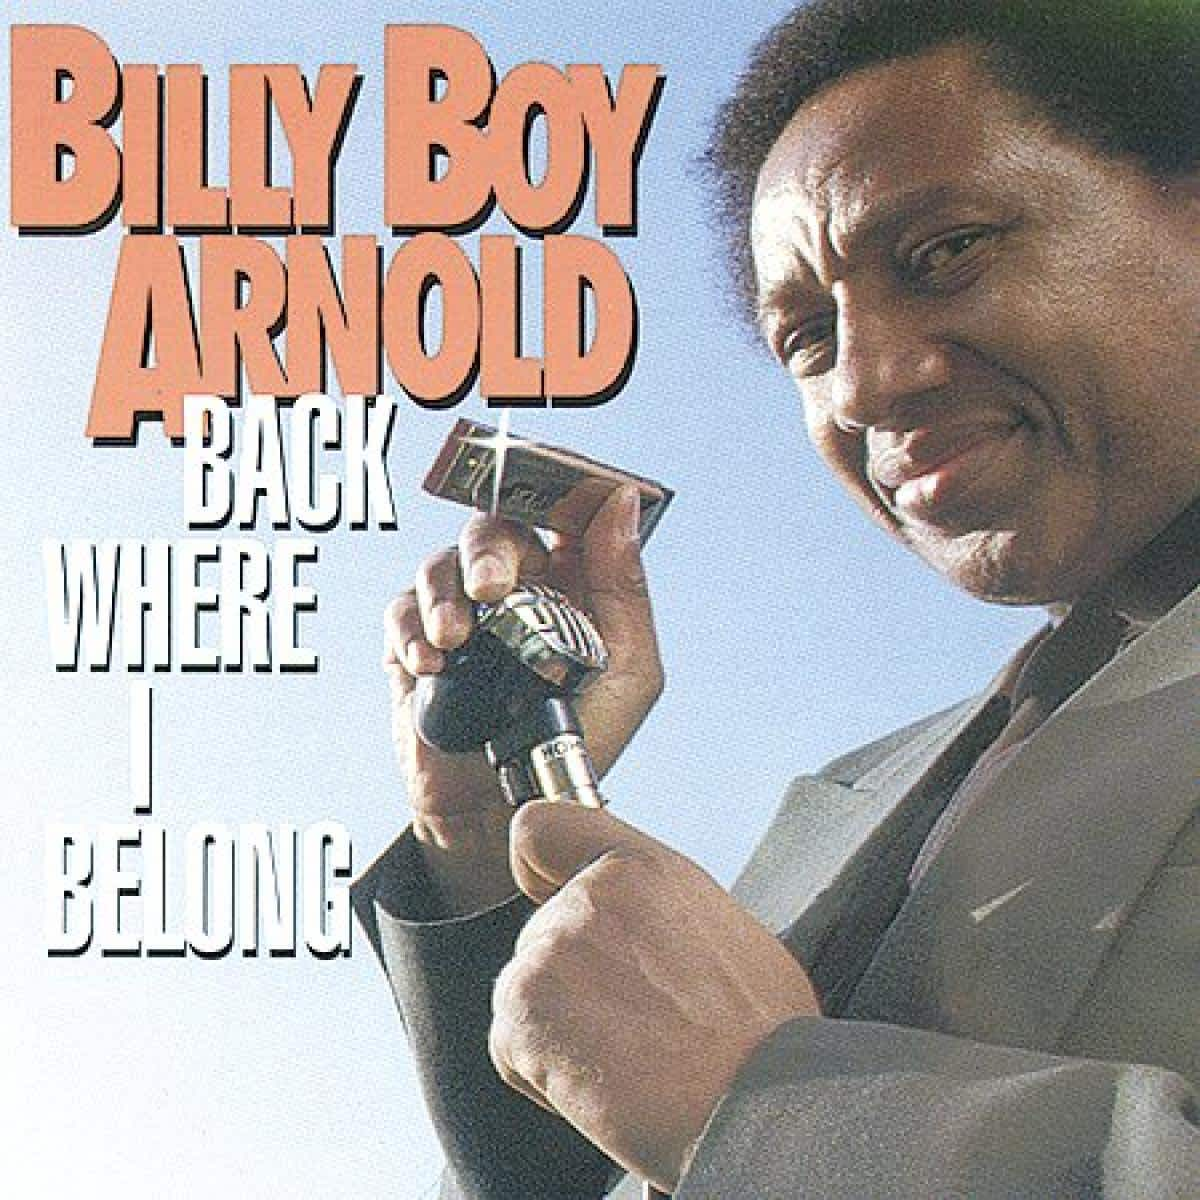 Billy boy Arnold – Back where I belong